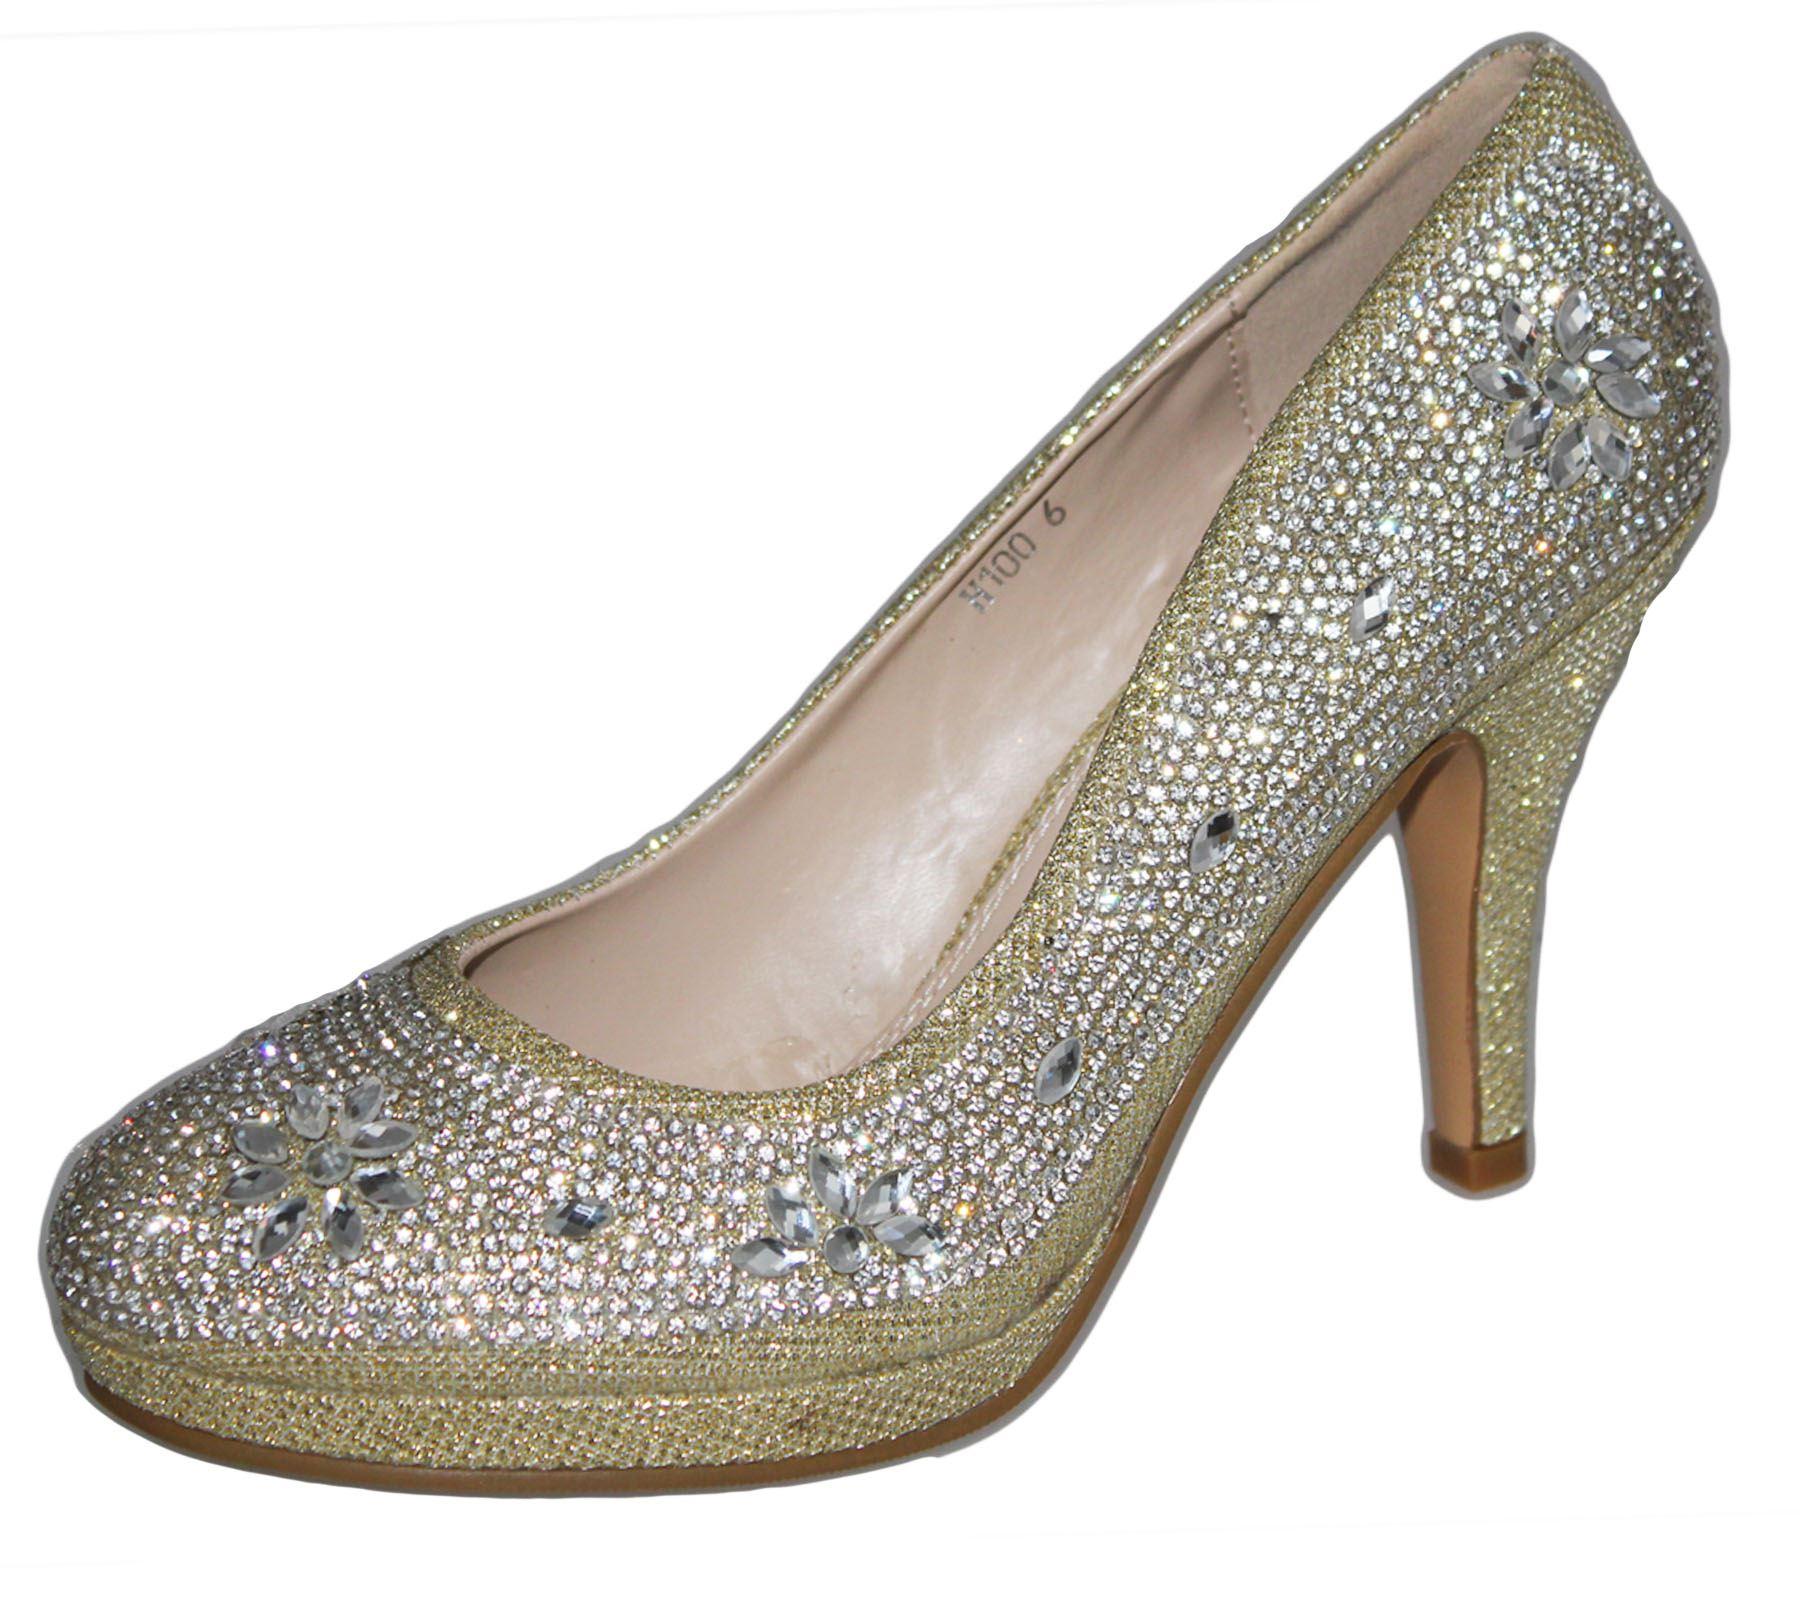 Womens-Platforms-High-Heels-Wedding-Bridal-Evening-Diamante-Ladies-Party-Shoes miniatura 20